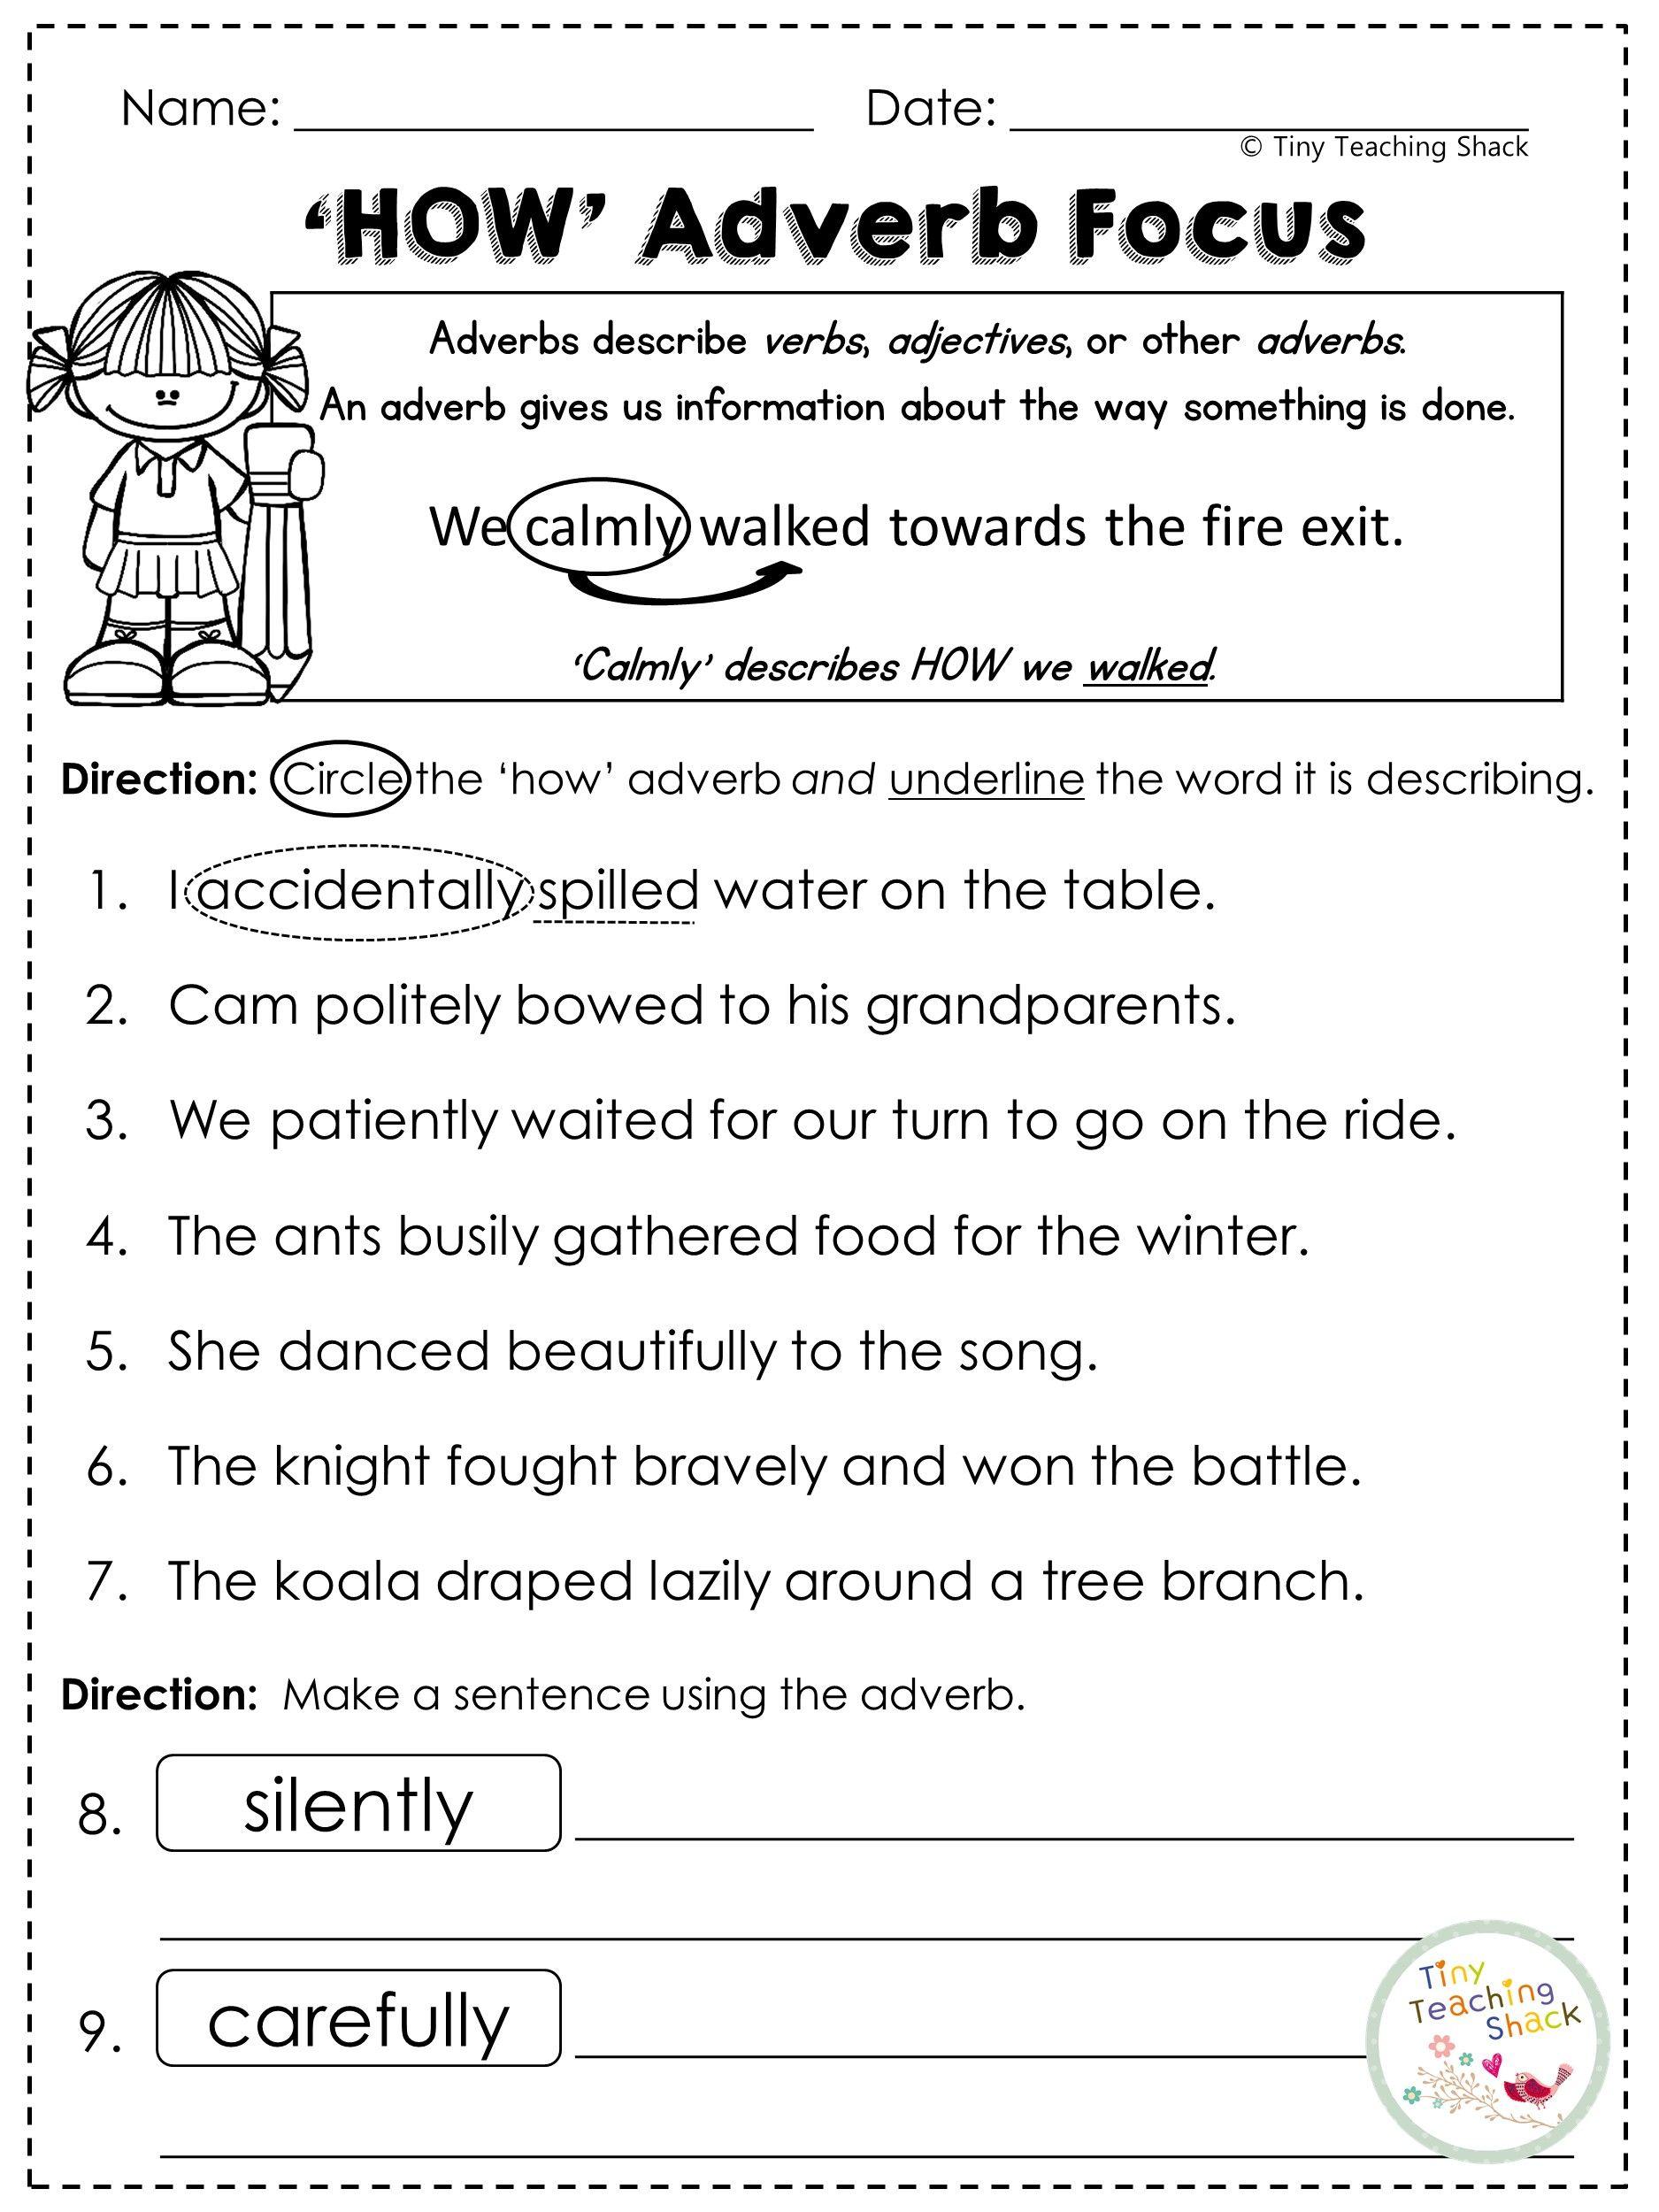 Adverbs Worksheet Adverbs Worksheet Adverbs Learn English Words